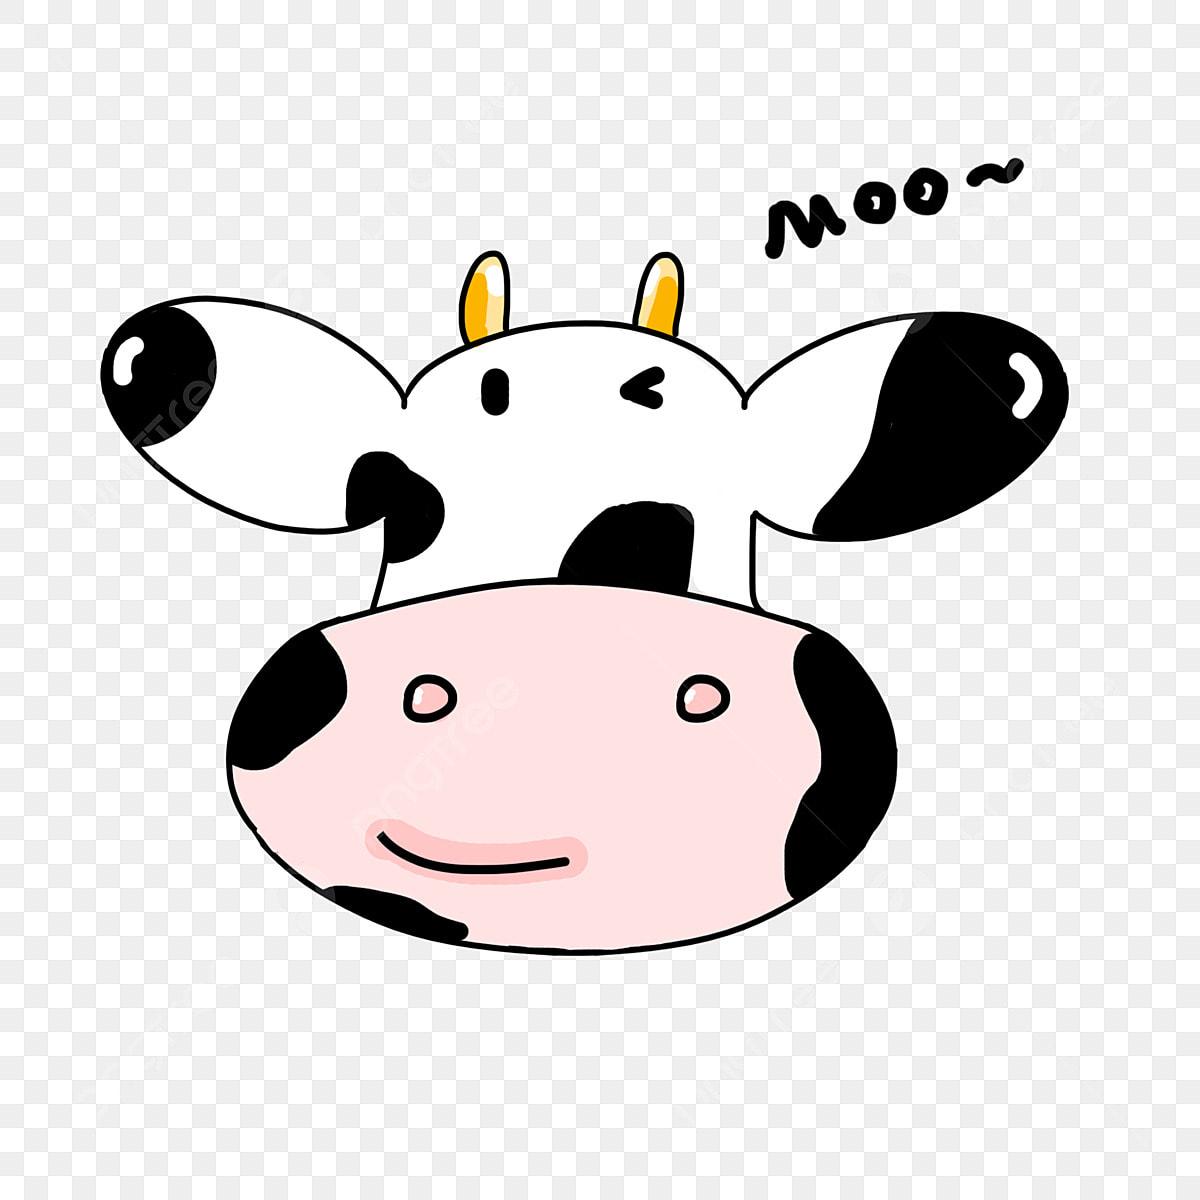 Kartun Putih Lembu El Avatar Haiwan Kepala Koboi Fail